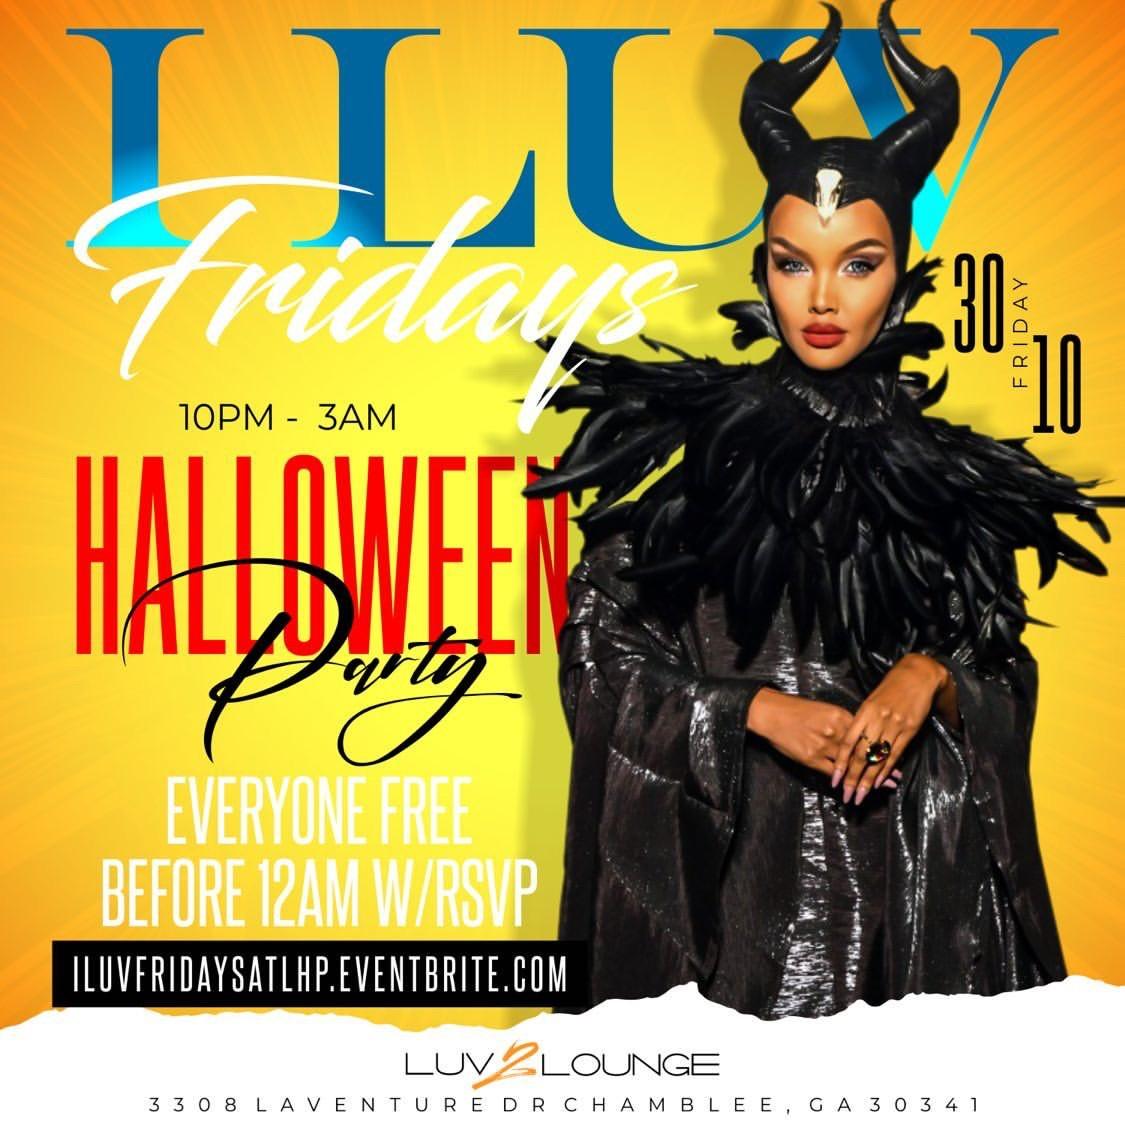 Atlanta Halloween Party 2020 I LUV FRIDAYS Atlanta Halloween Party 2020   No Cover before 12am